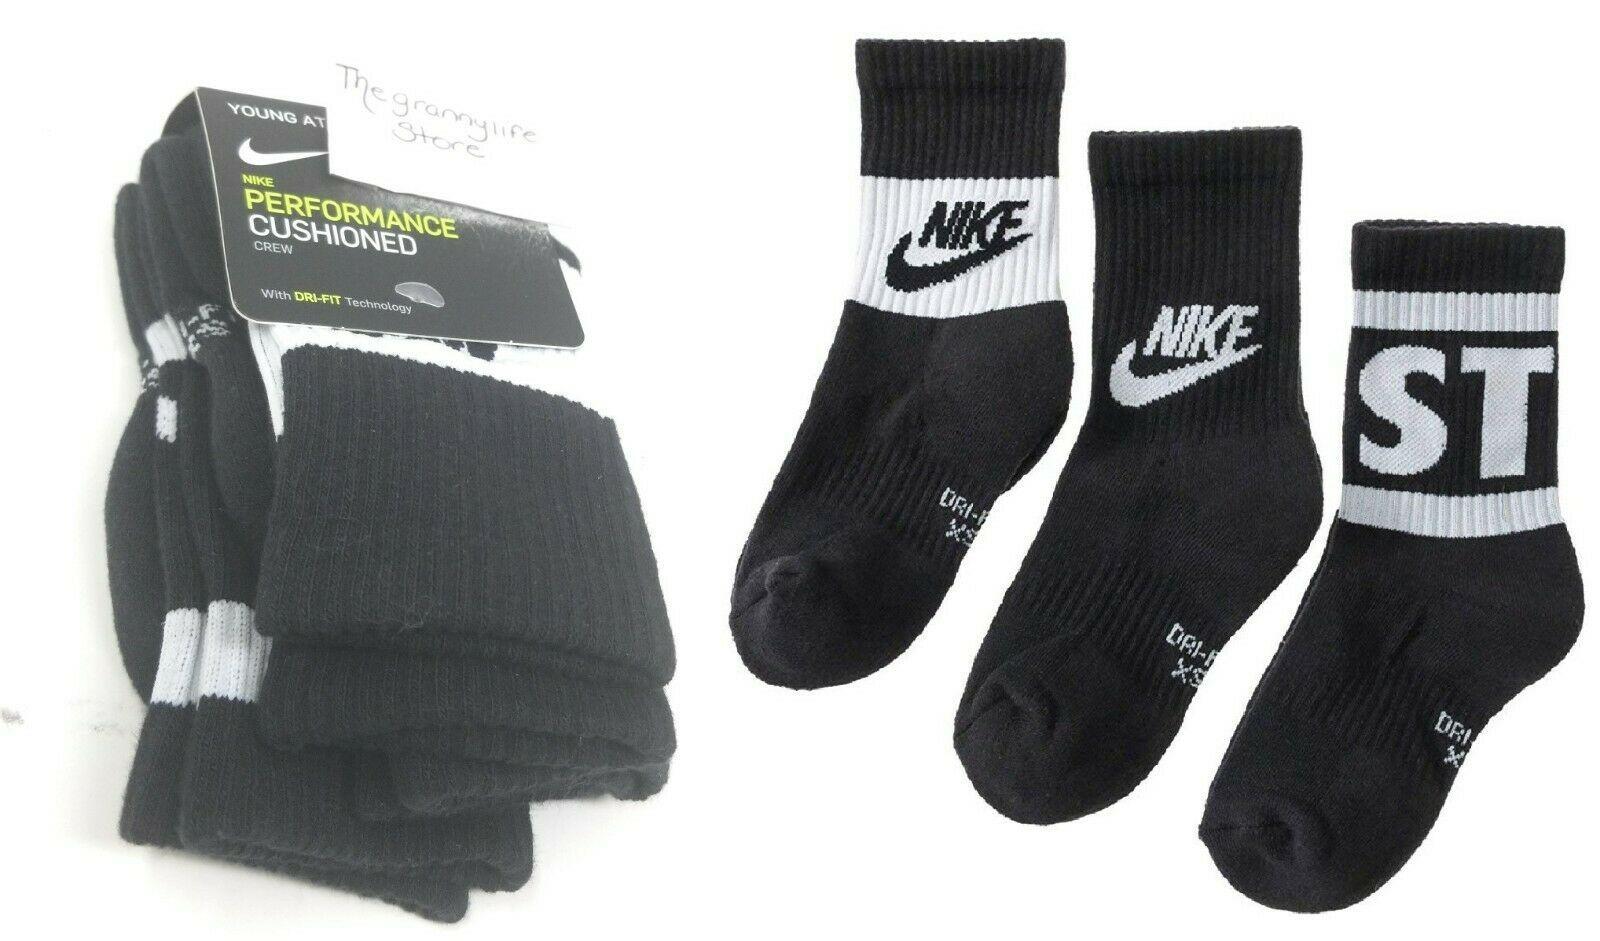 Nike Youth Boys Crew Socks sz XS 10C-3Y Black Dri Fit Cotton Cushion Performance